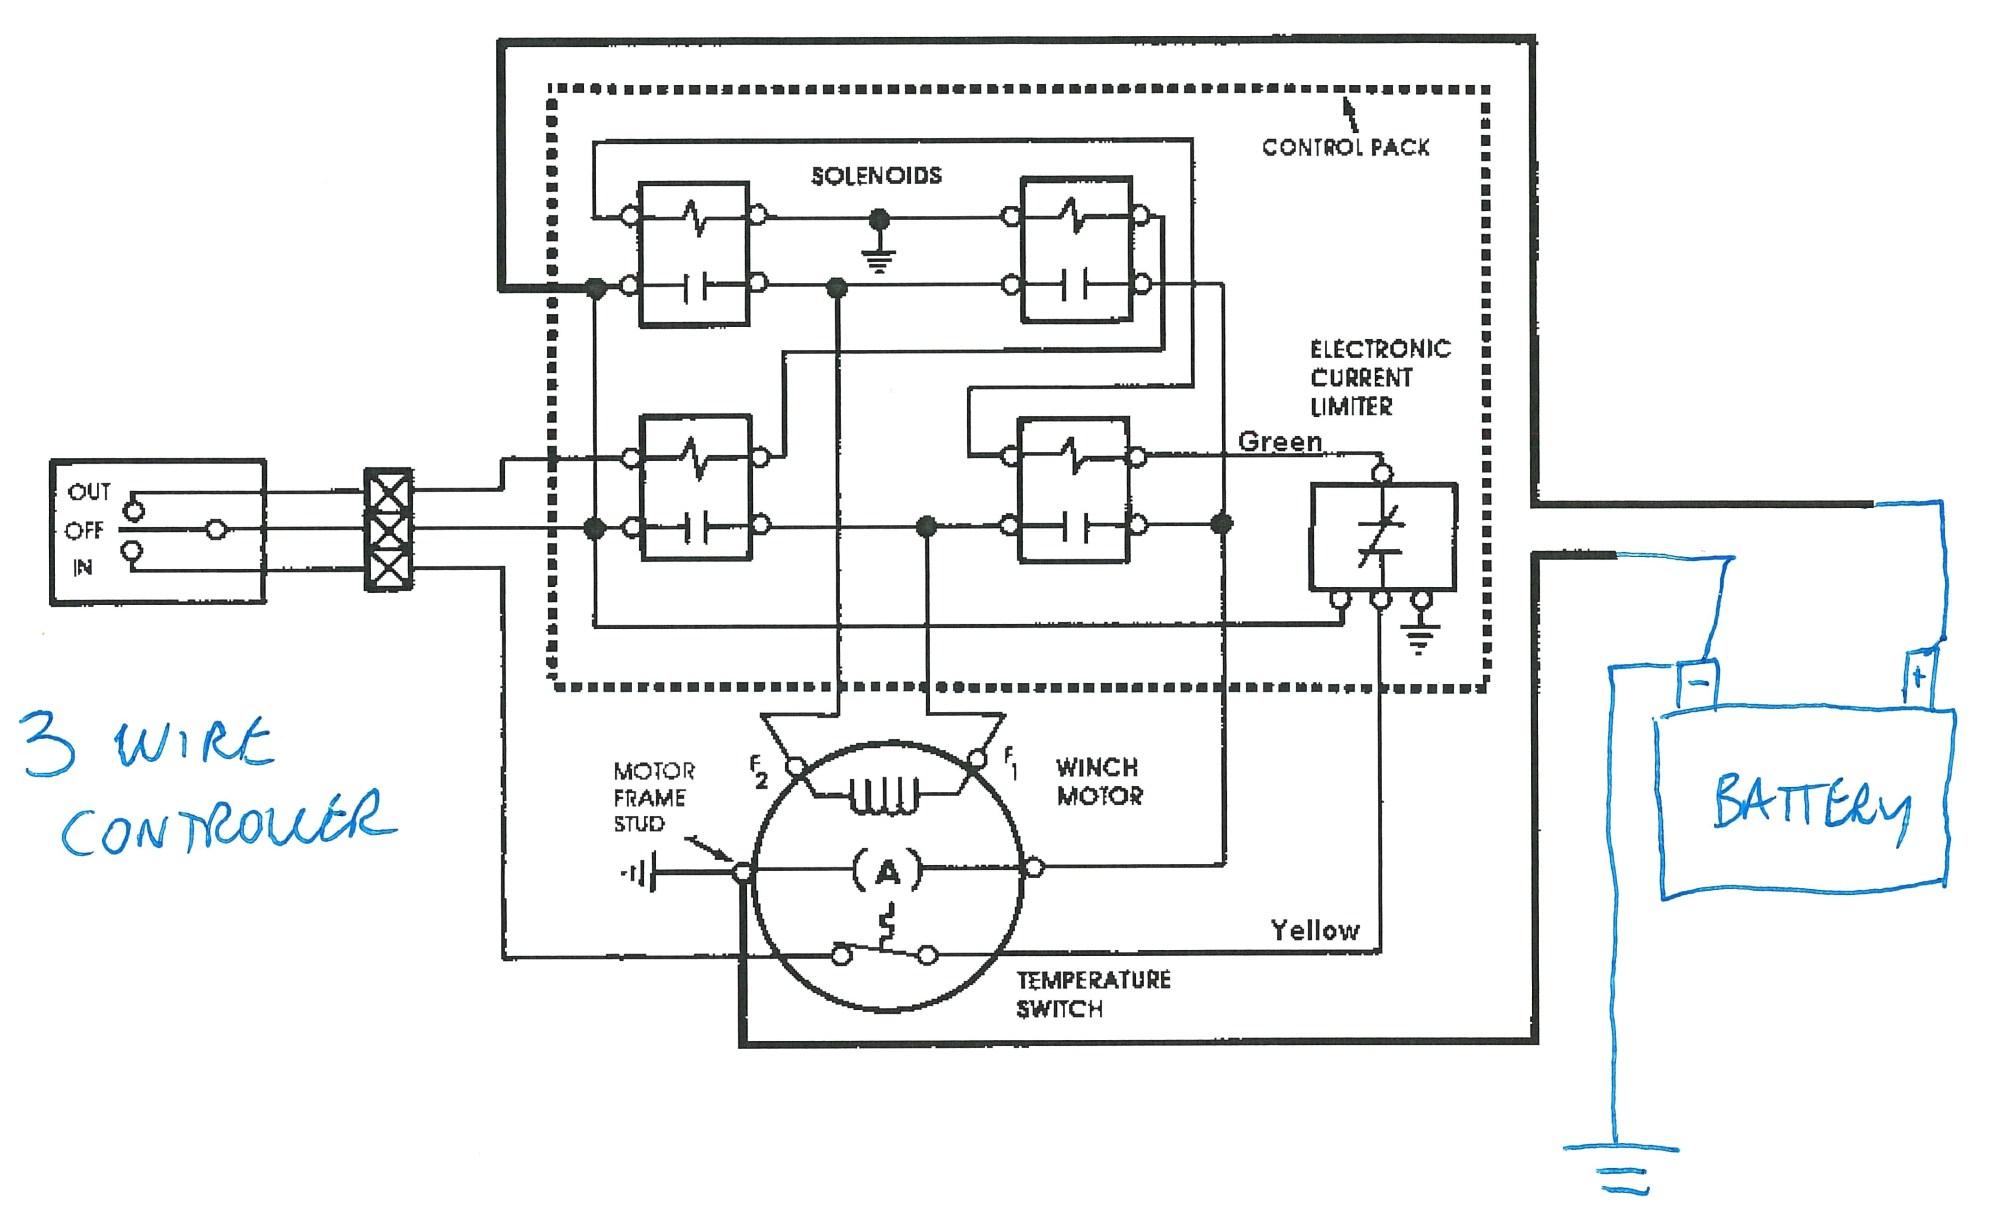 hight resolution of warn winch wiring diagram 4 solenoid